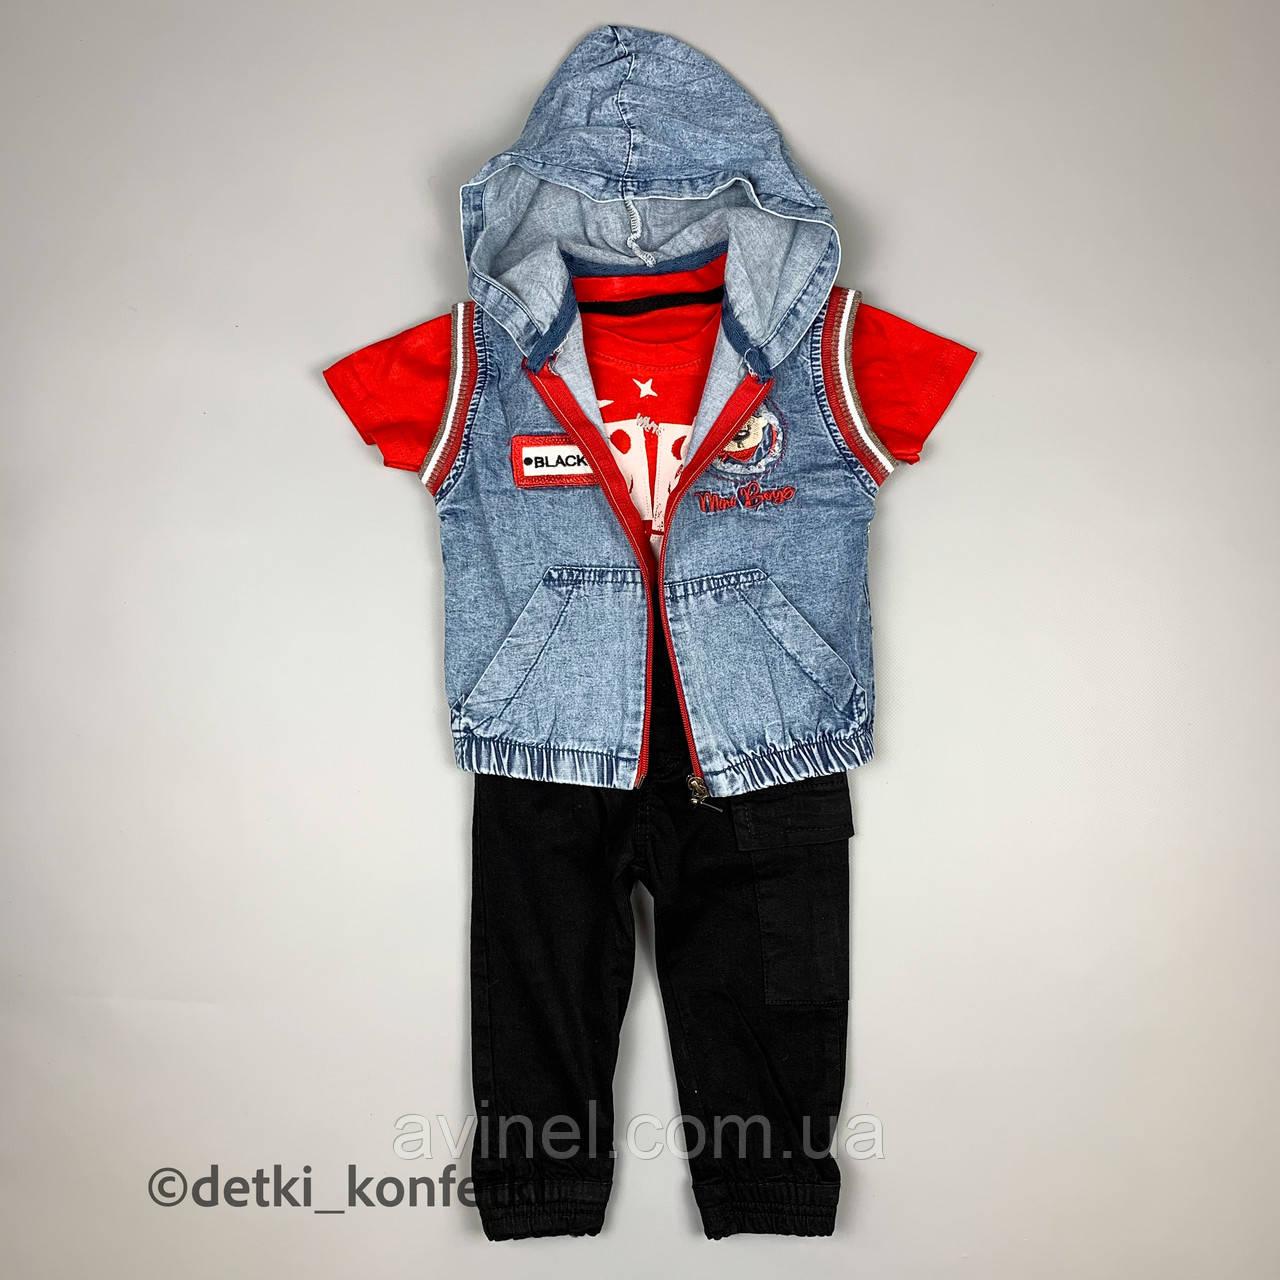 Комплект фут+штани+підтяжки+Помаранчевий жилет 0256 concept Туреччина 74(р)